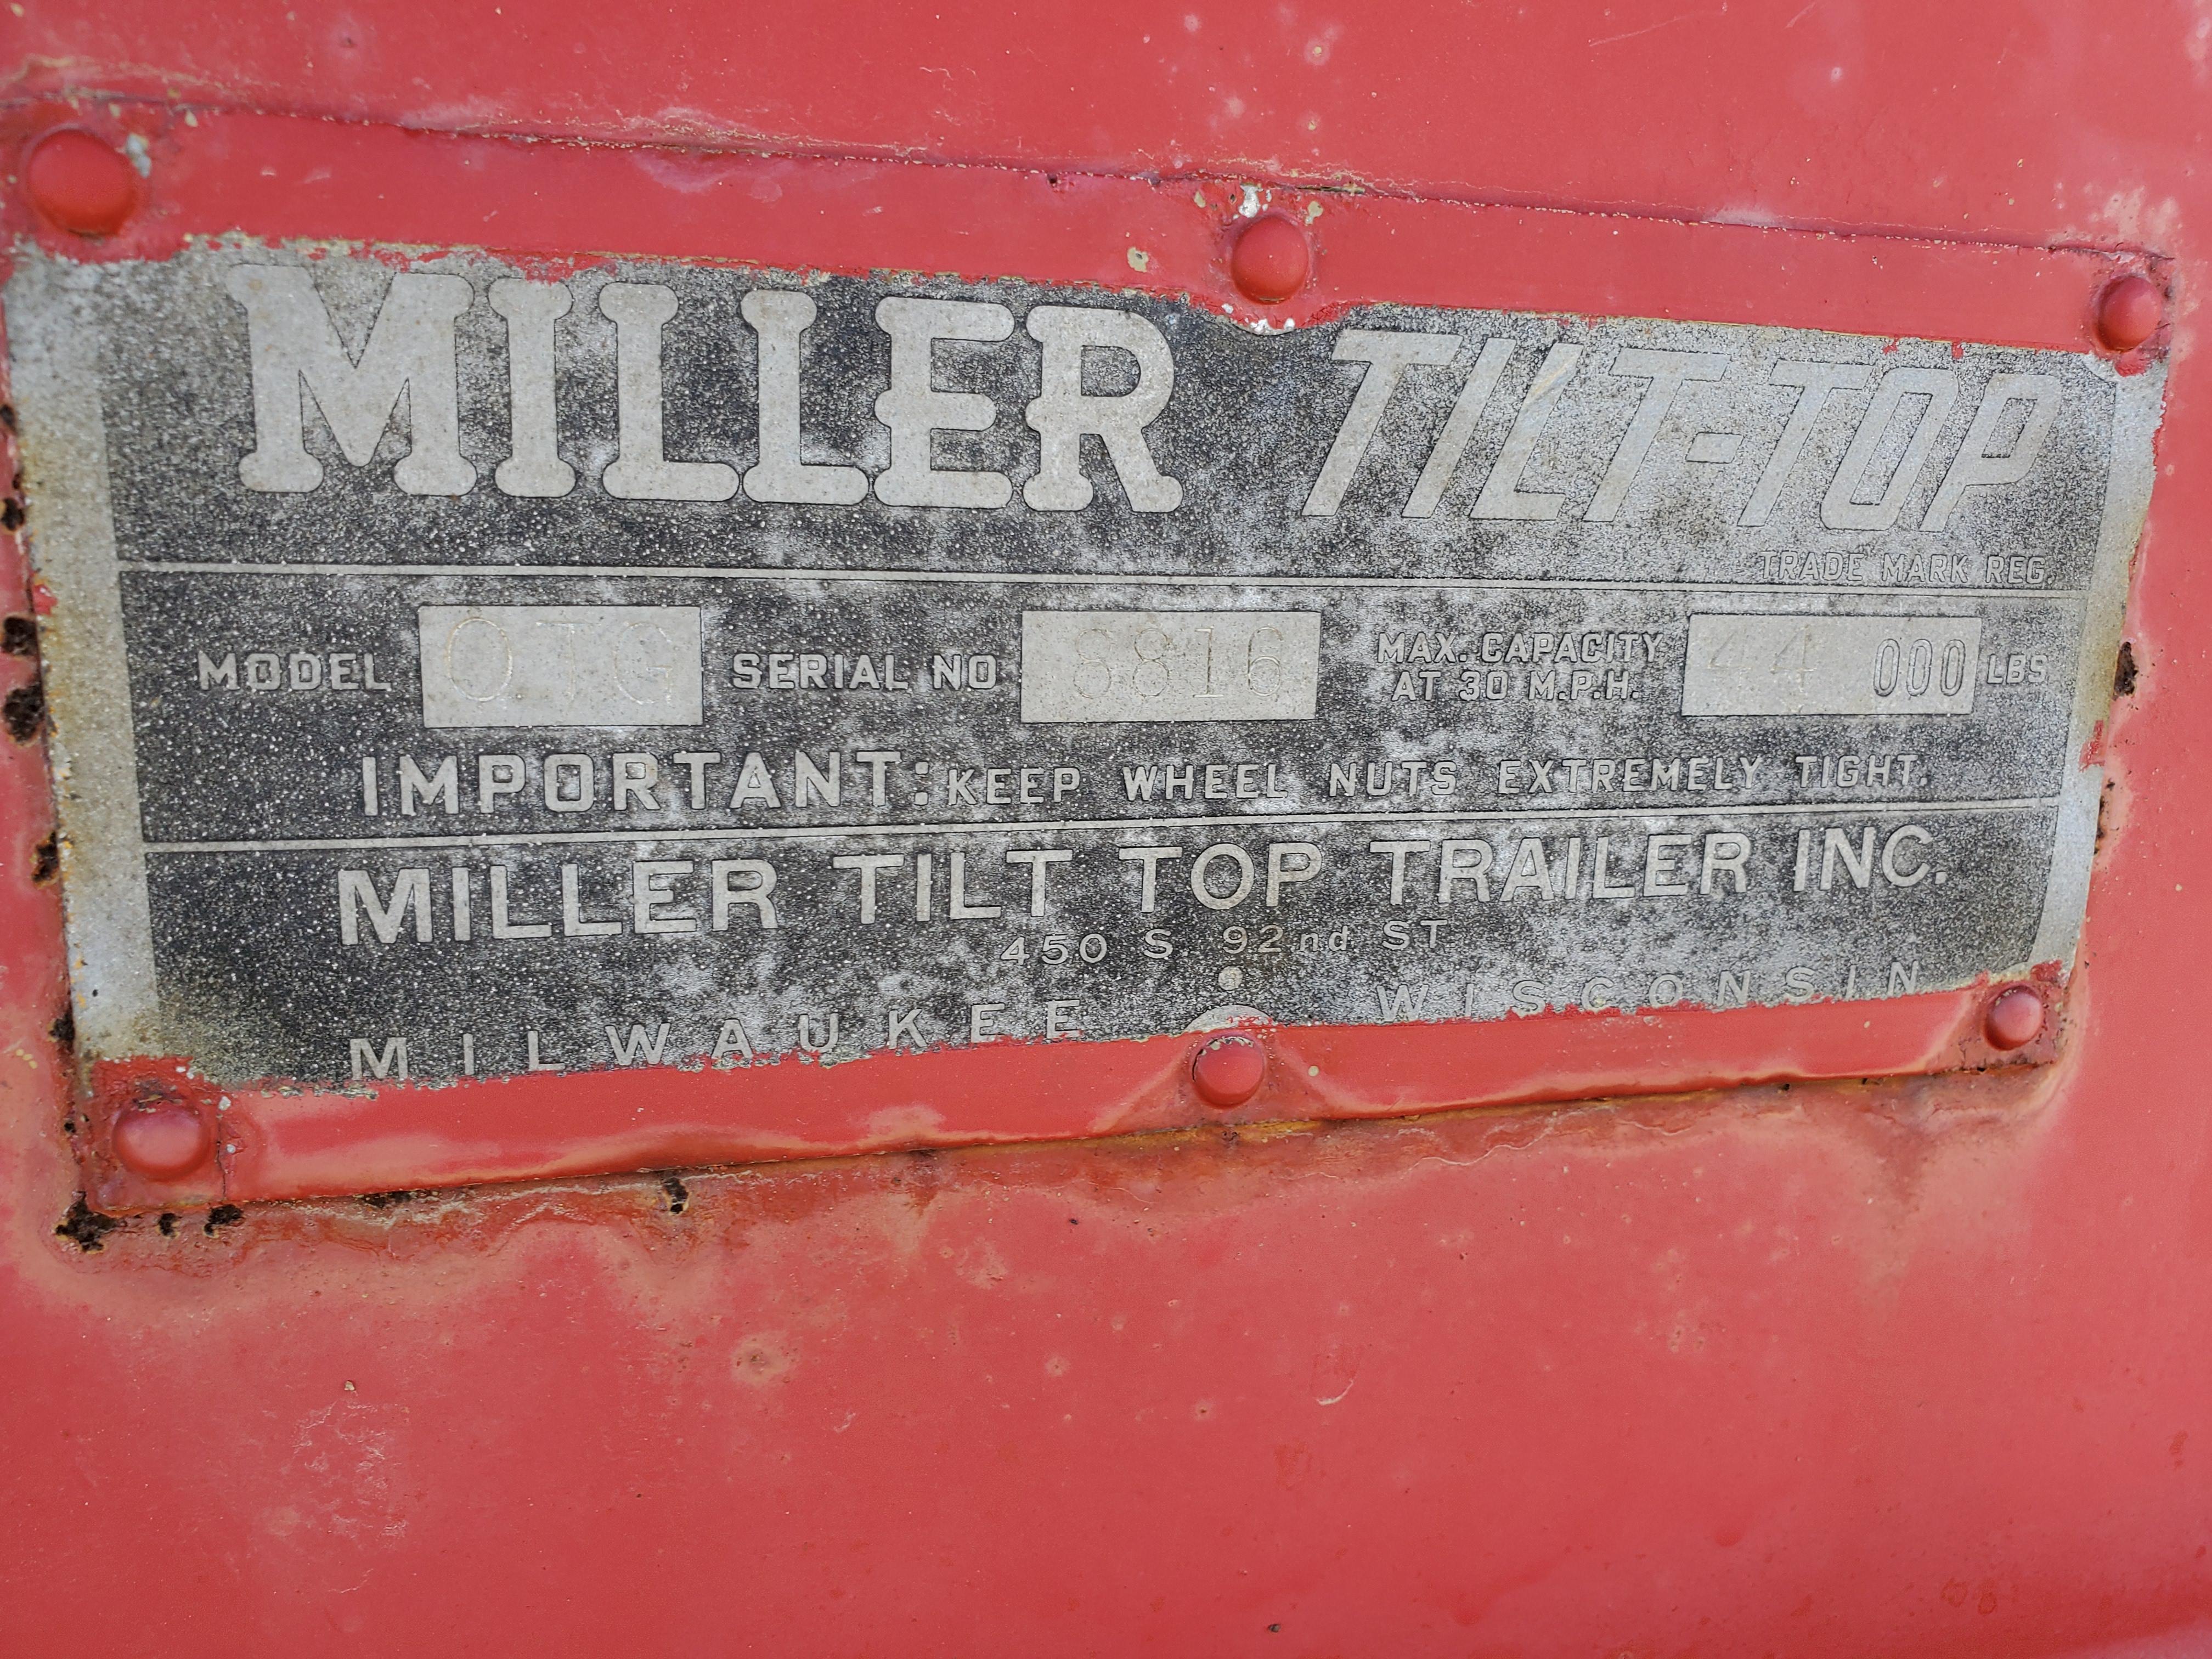 Miller Tilt Top Trailer Model OTG, s/n 8816, 22 ft. Long x 8 ft. Wide, Tandem Axle w/ Dual Wheels - Image 7 of 7